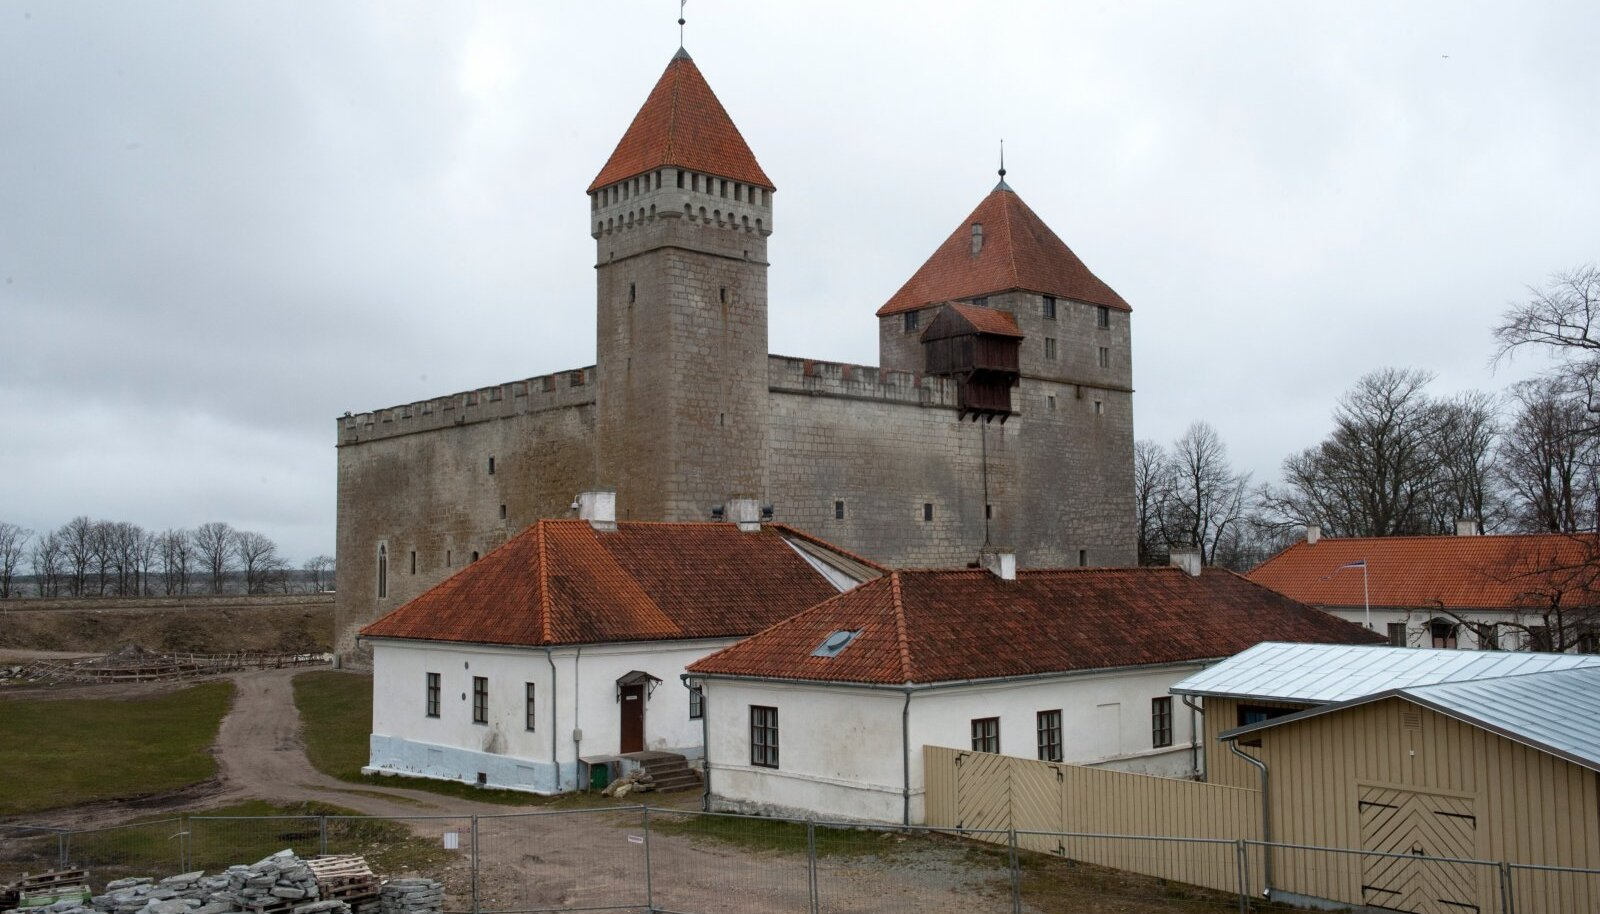 Kuressaare, Saaremaa